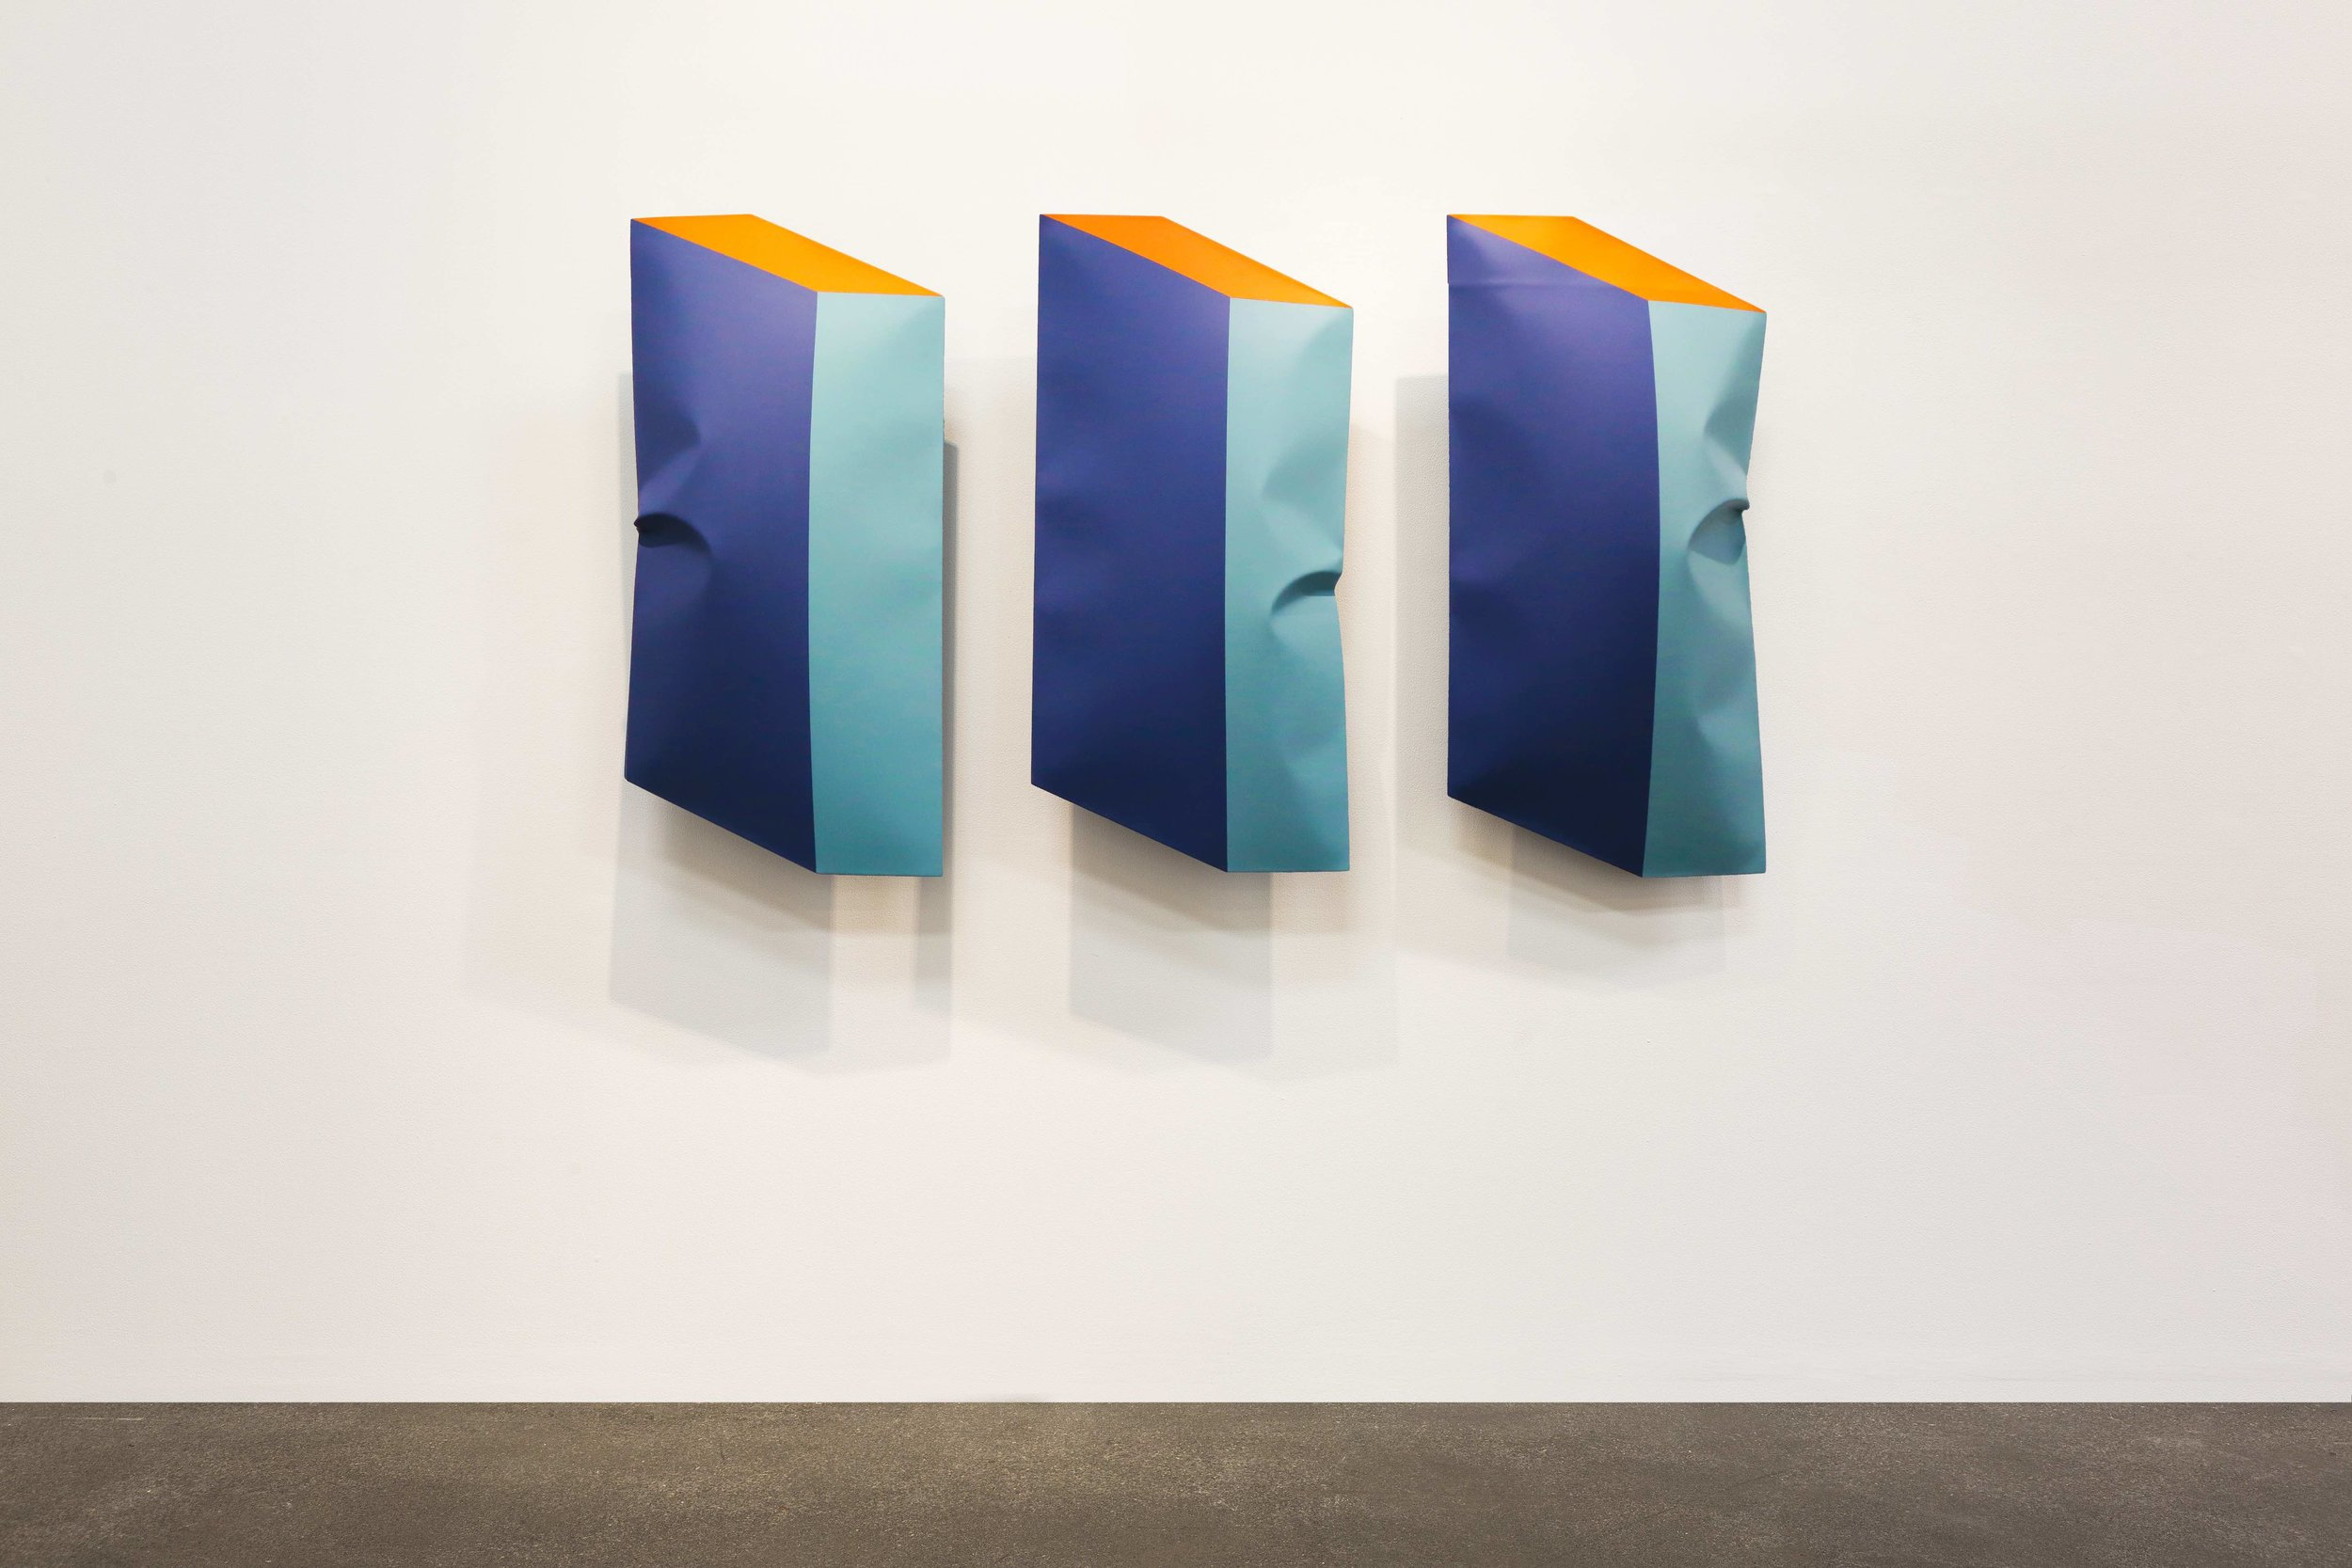 Shaikha Al Mazrou, Extend (2018). As exhibited by Lawrie Shabibi Gallery from Dubai. Courtesy Lawrie Shabibi.